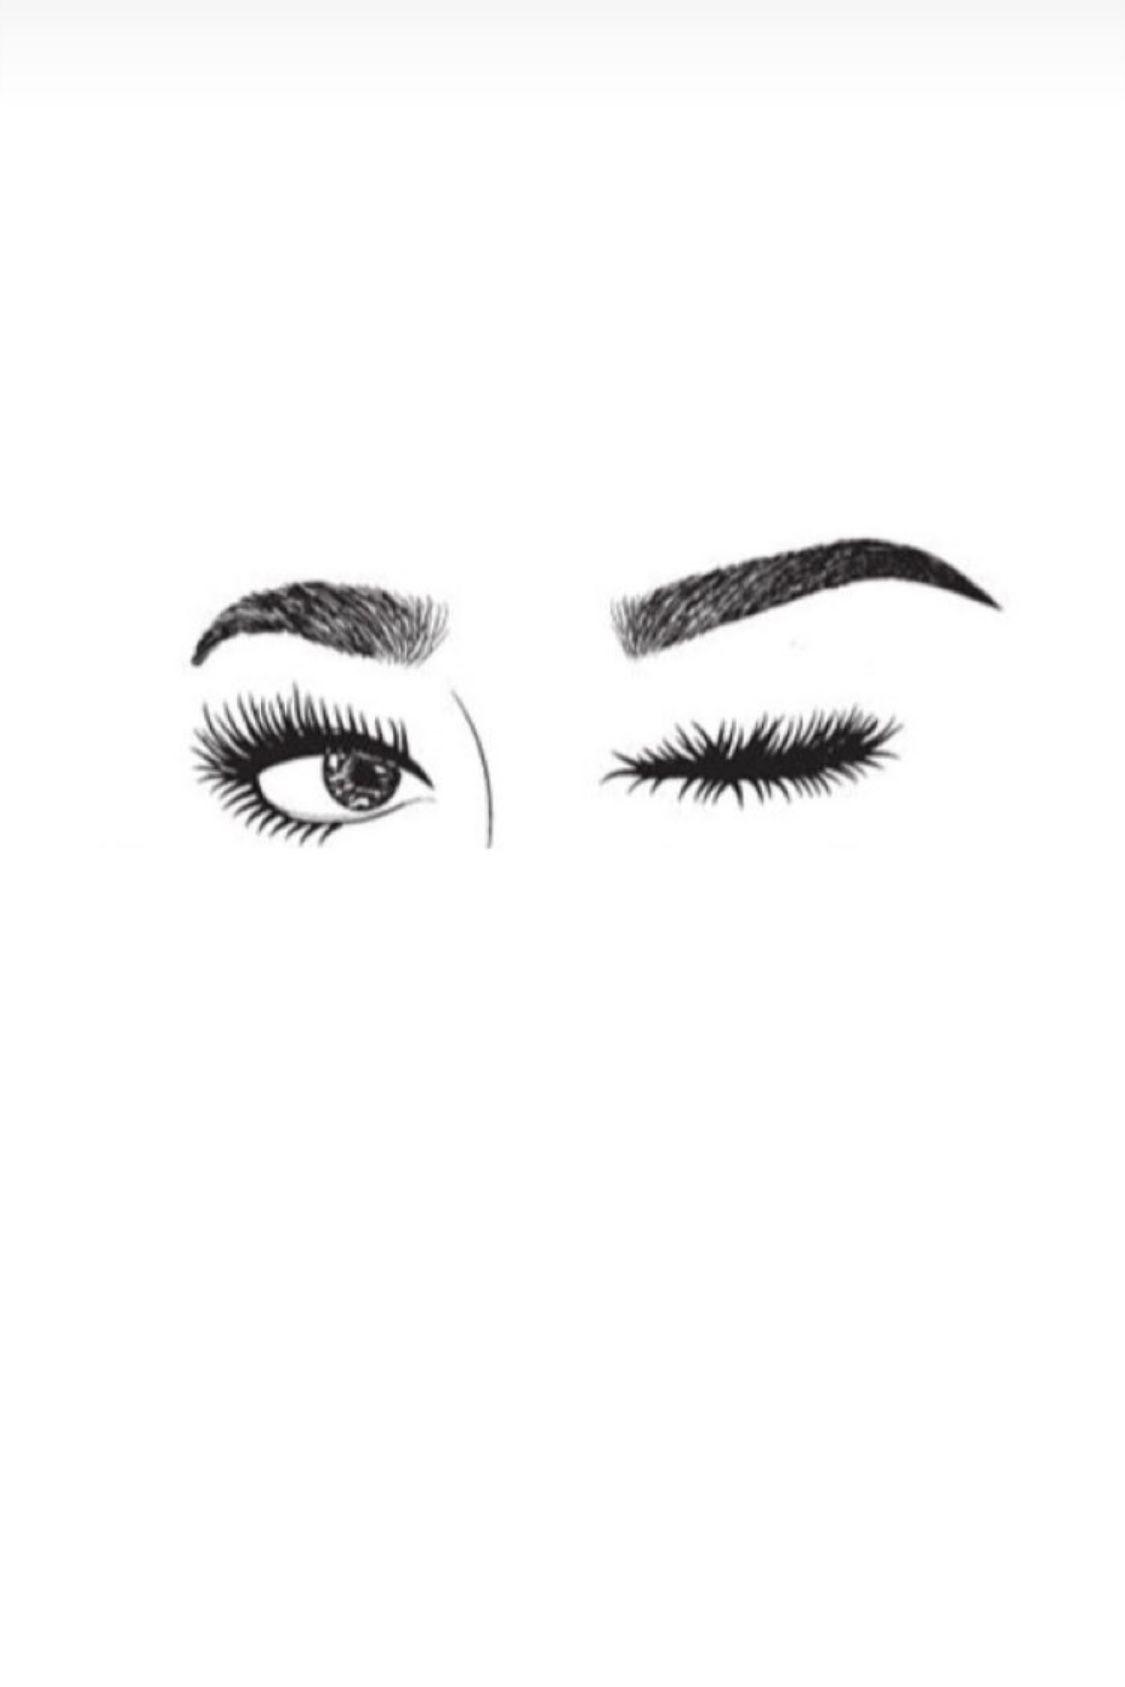 pinterest-MadelynMicklos | b e a u t y in 2019 | Makeup ...